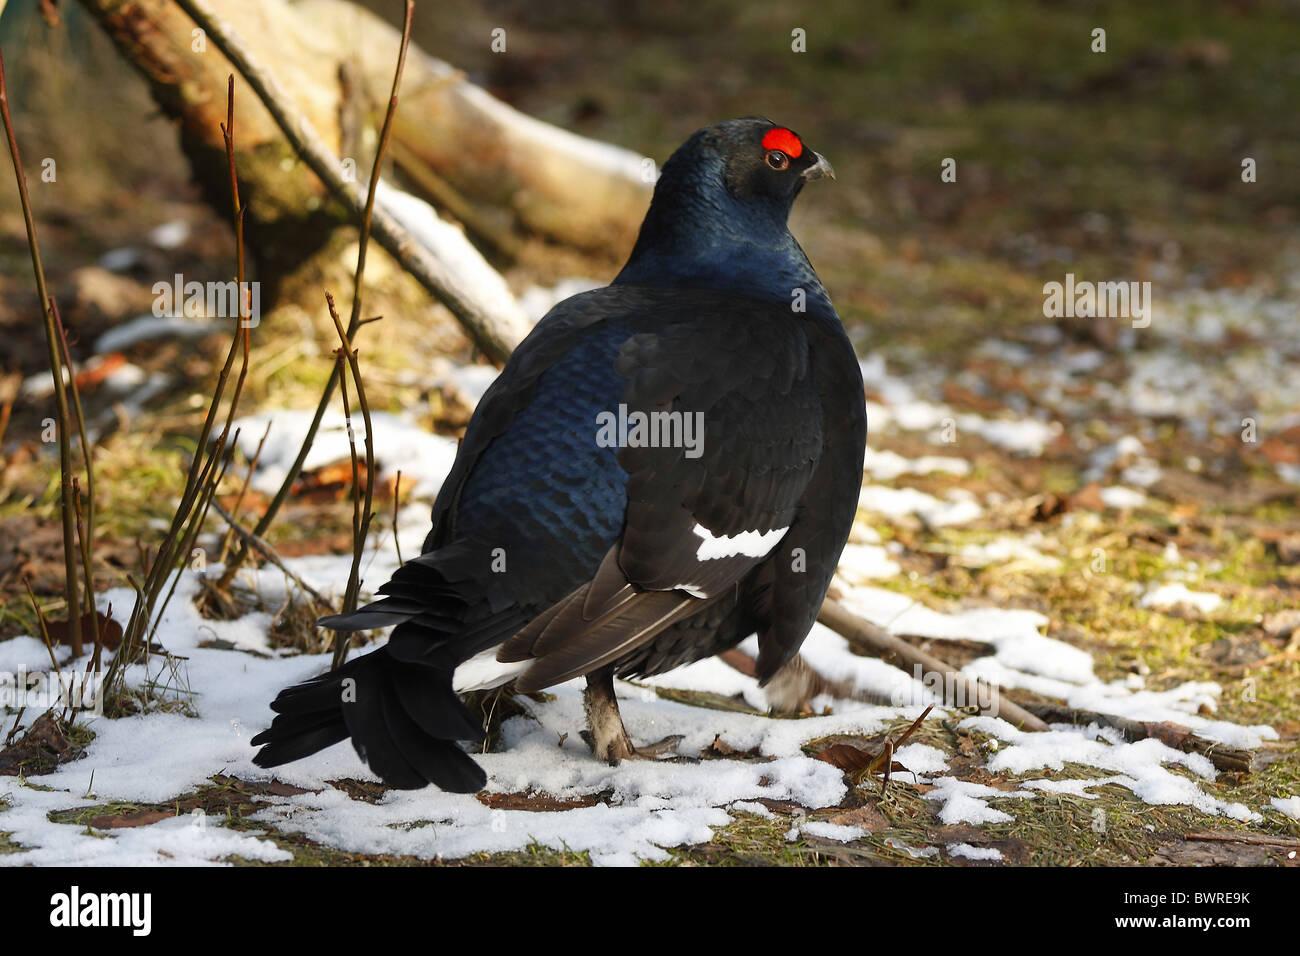 Black Grouse Blackgame Tetrao tetrix Lyrurus tetrix Germany Europe Bavaria Bavarian Forest male bird winter - Stock Image